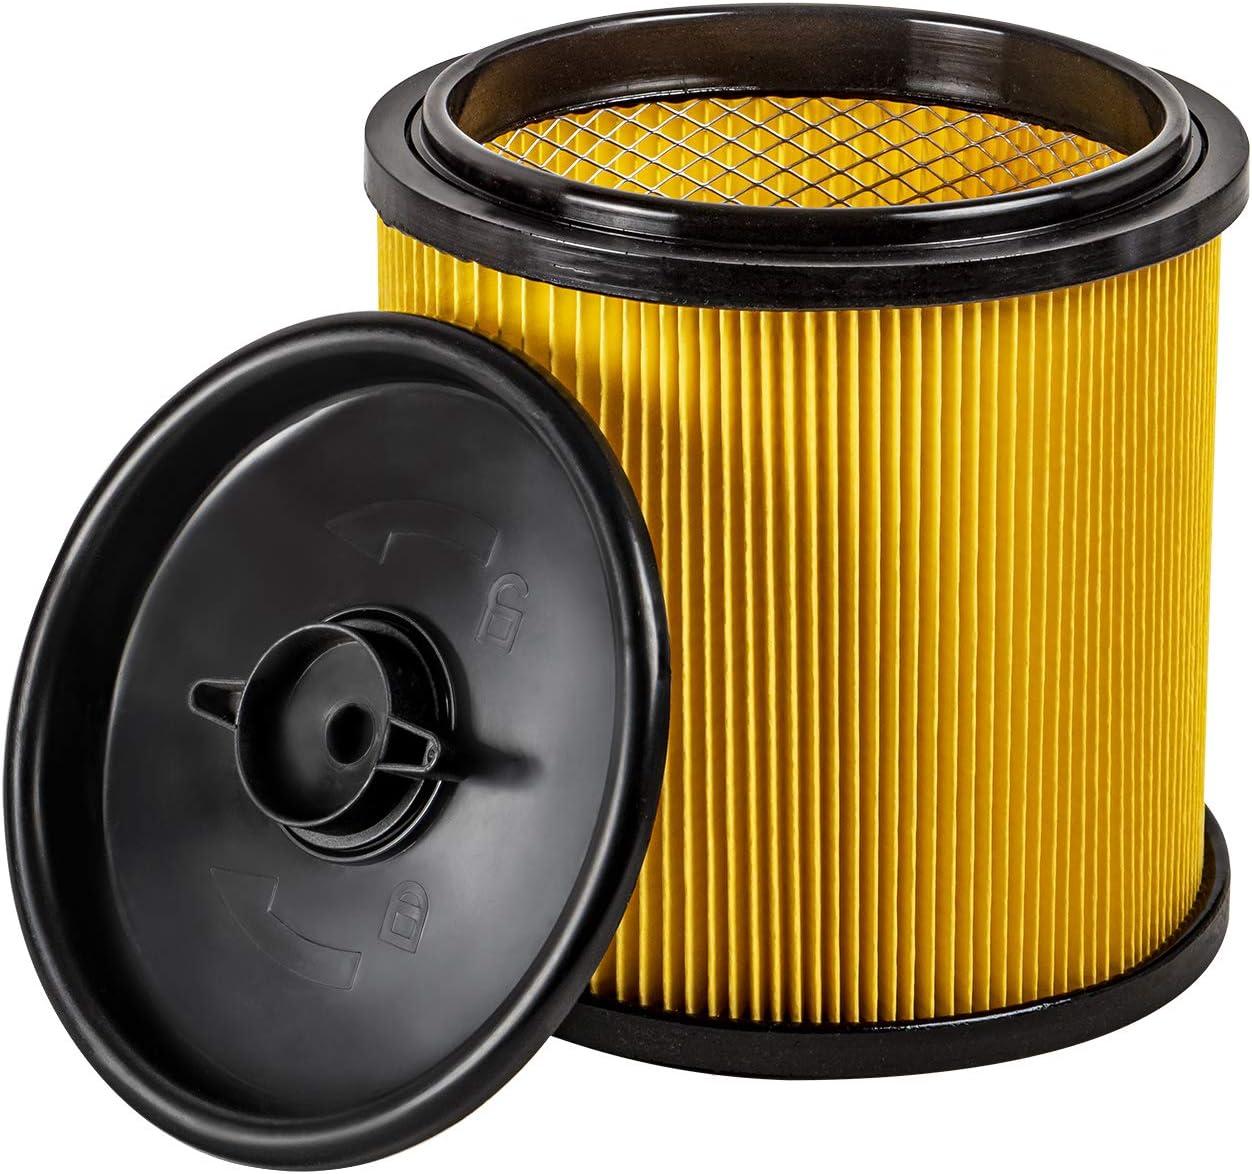 Vacmaster Standard Cartidge Filter & Retainer, VCFS 71gVndgOPpL